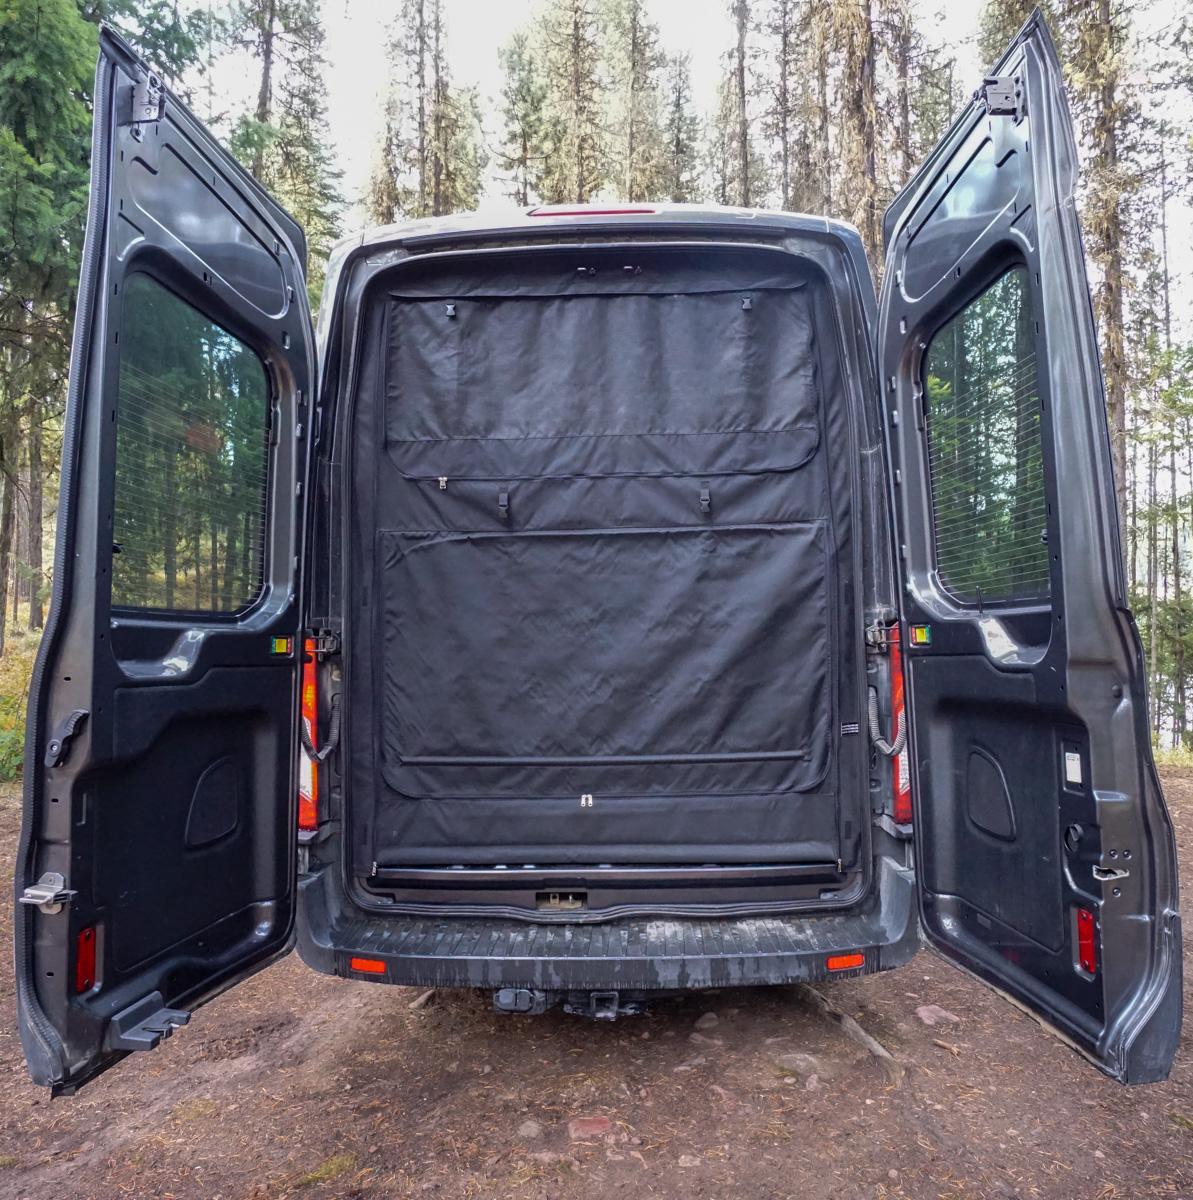 Exterior Shower For Camper Van Conversion Faroutride